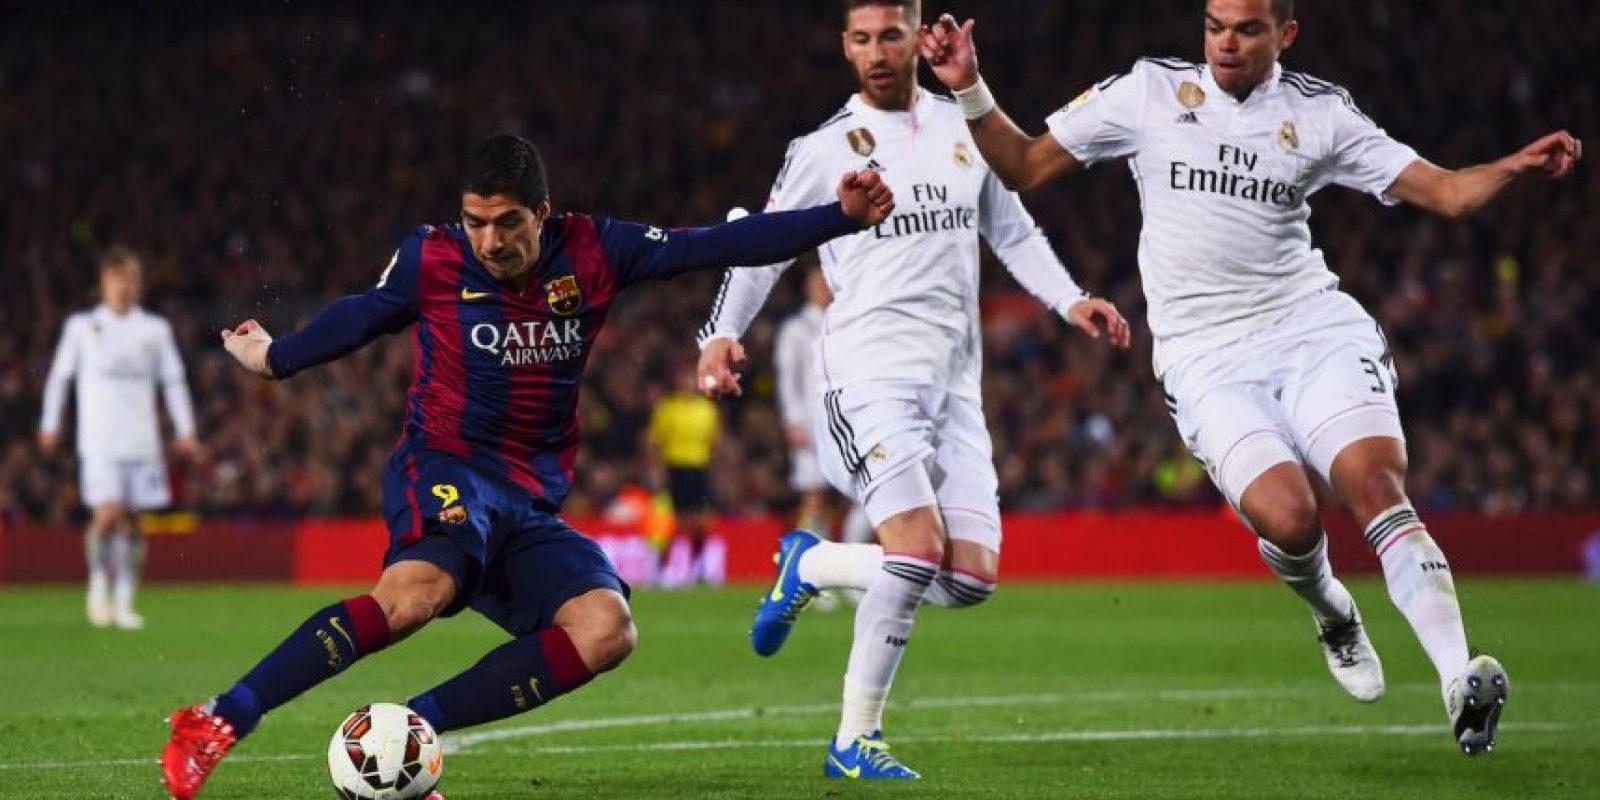 Suárez recibió el pase de Dani Alves, controló el balón y remató al arco del Real Madrid. Foto:Getty Images